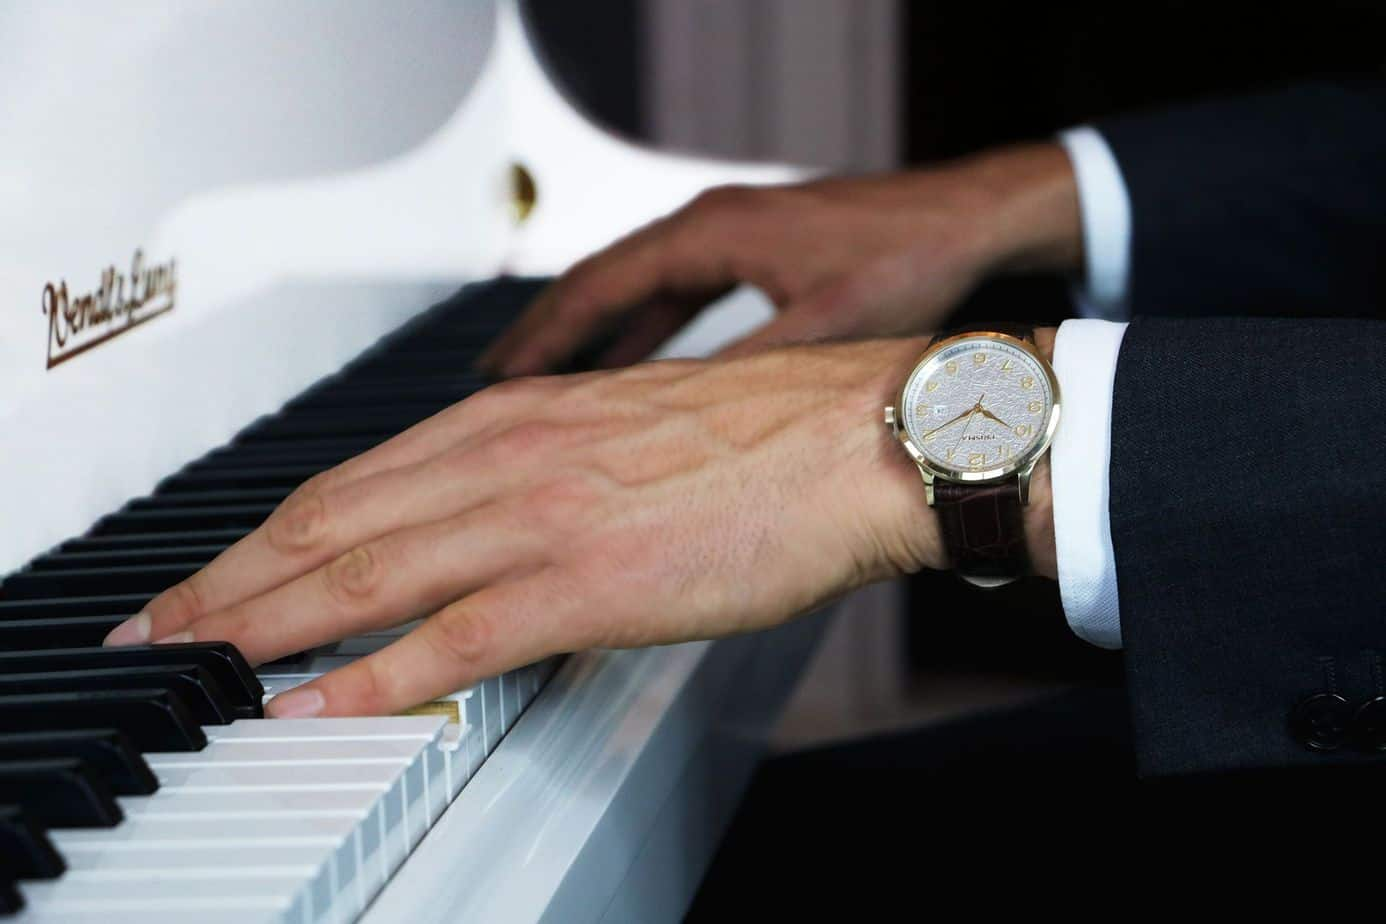 prisma horloges signature carbon watches dutch watch brand quality classical watch beauty klassieke horloge